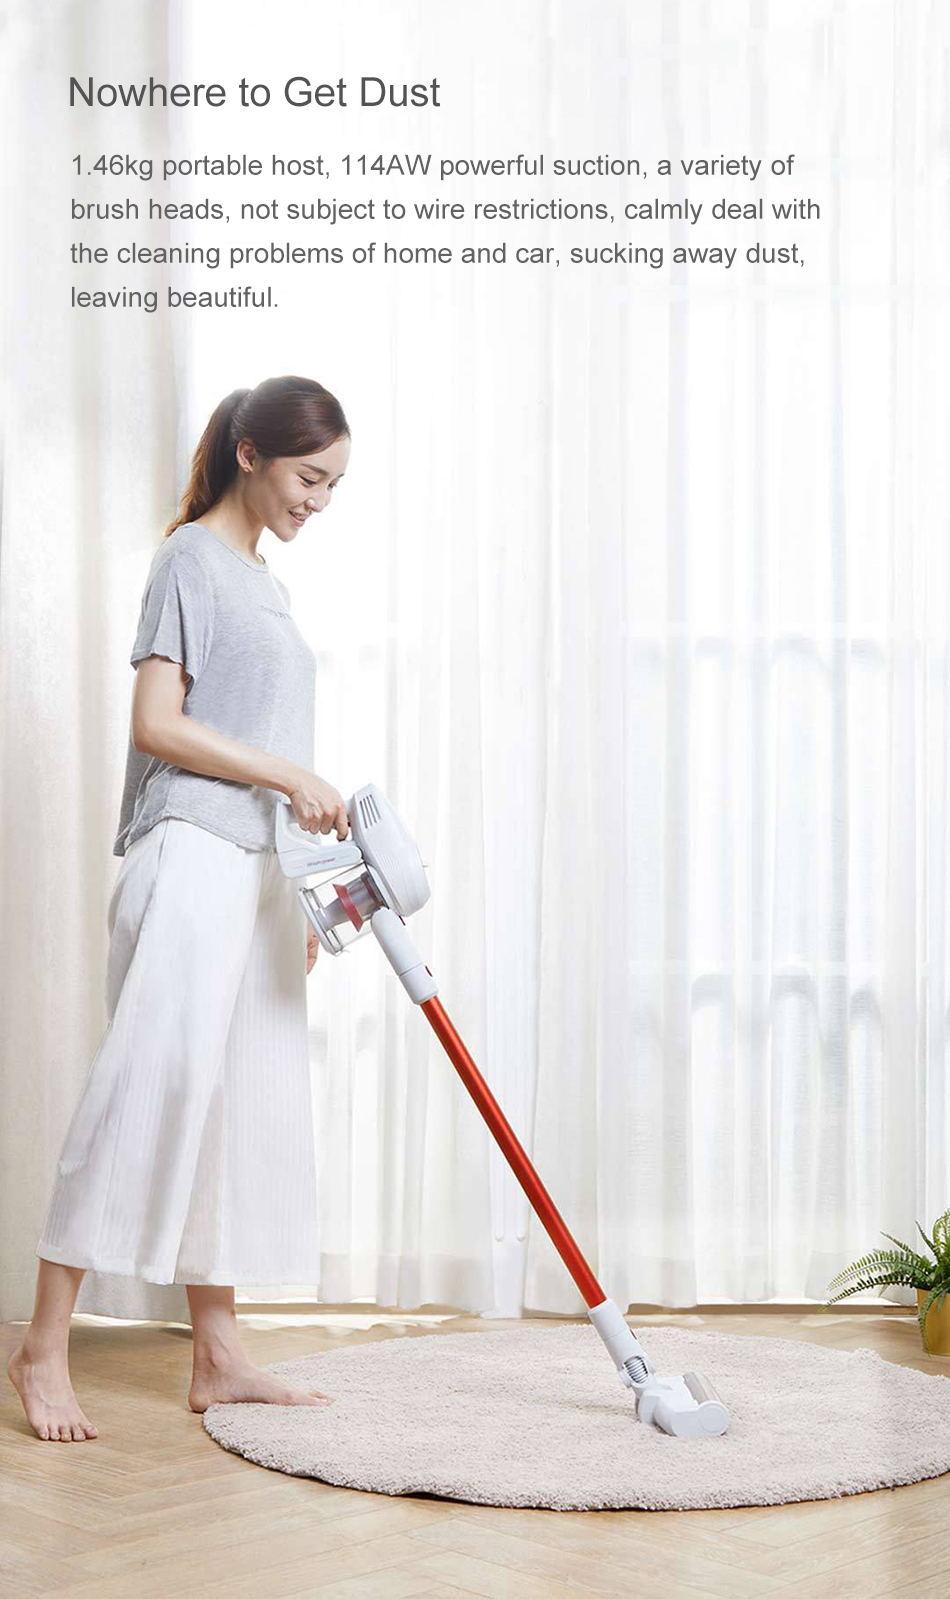 jimmy jv51 handheld wireless vacuum cleaner